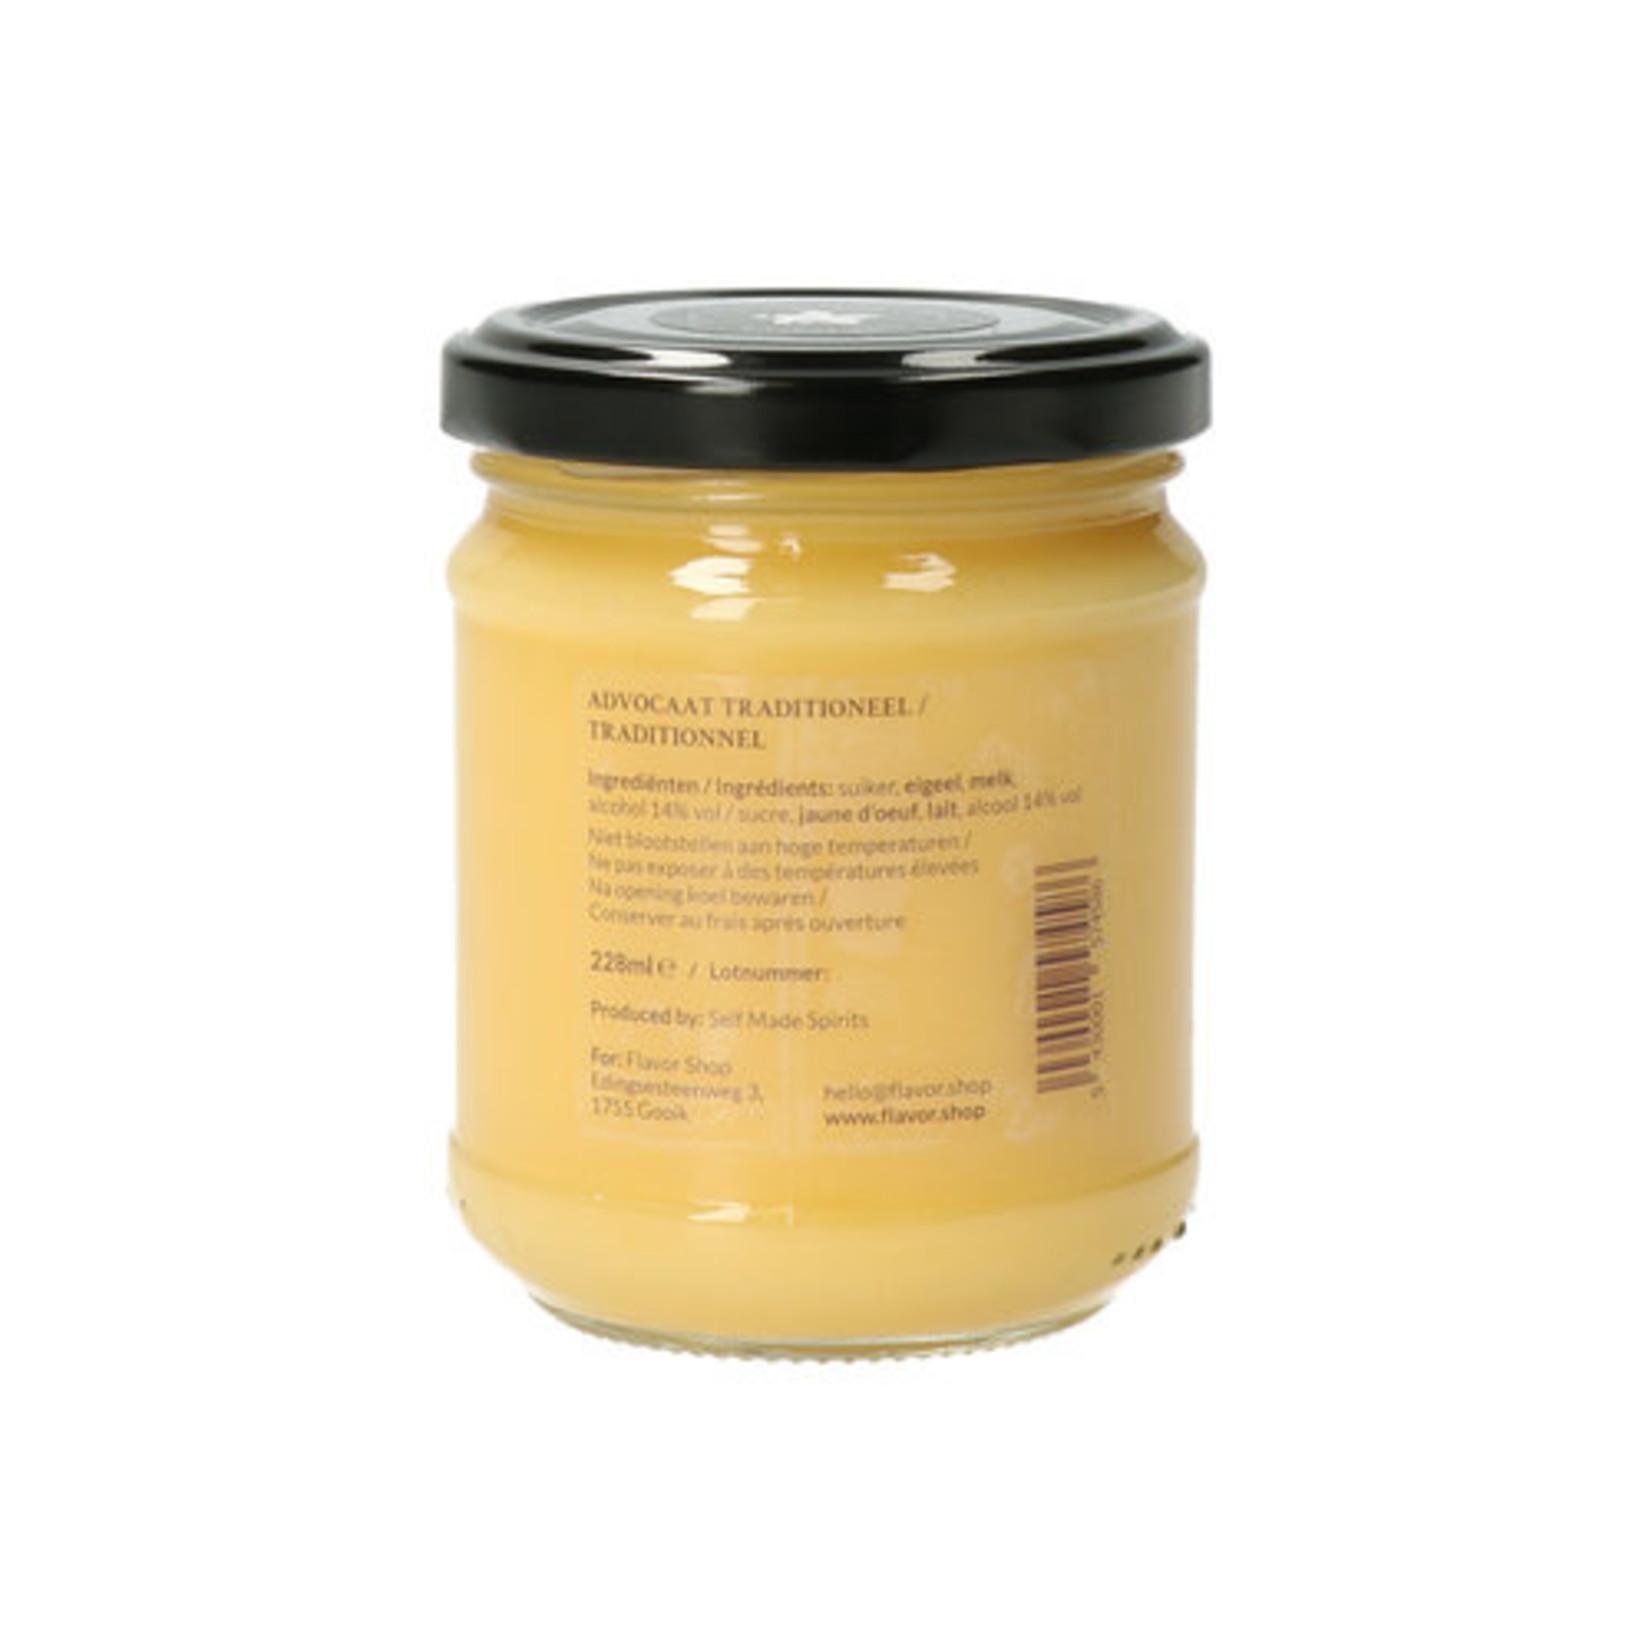 Pure Flavor Advocaat Traditioneel 228ml